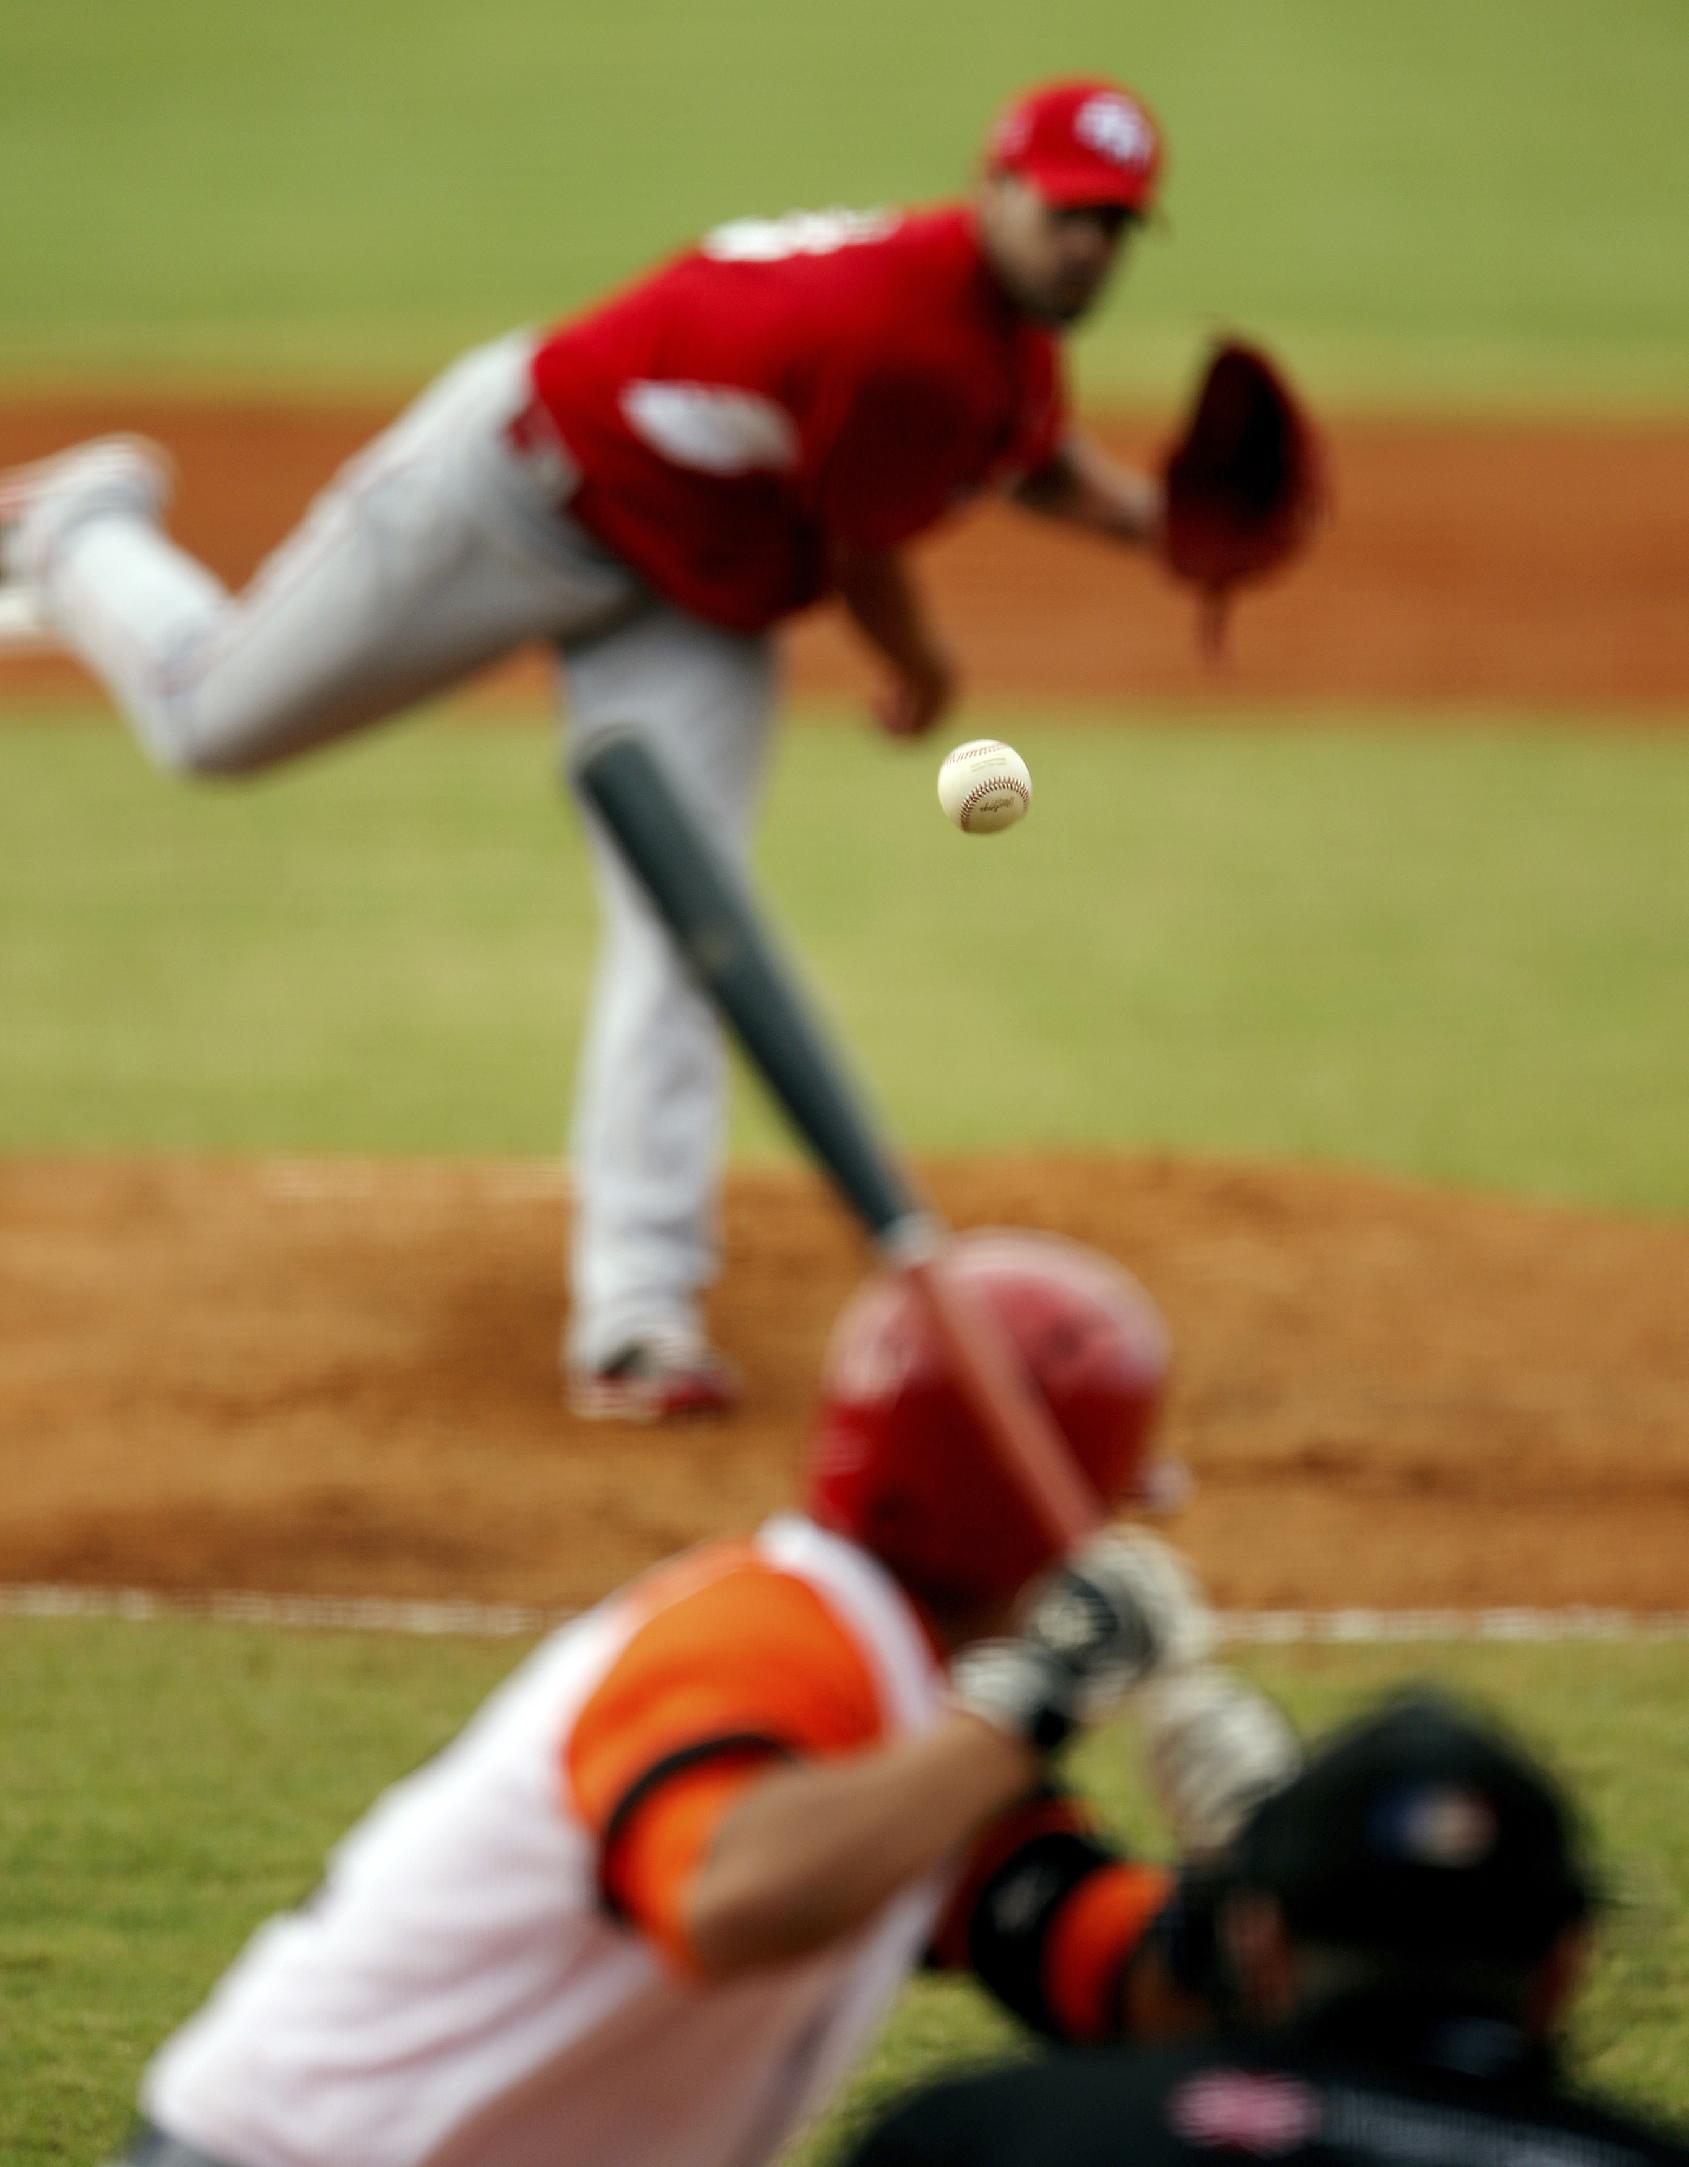 Puerto Rico pitcher Joel Pinero pitches to Cuba infielder Yulieski Gourriel in the first inning of their Caribbean Series baseball game in Porlamar, Venezuela, Tuesday, Feb. 4, 2014